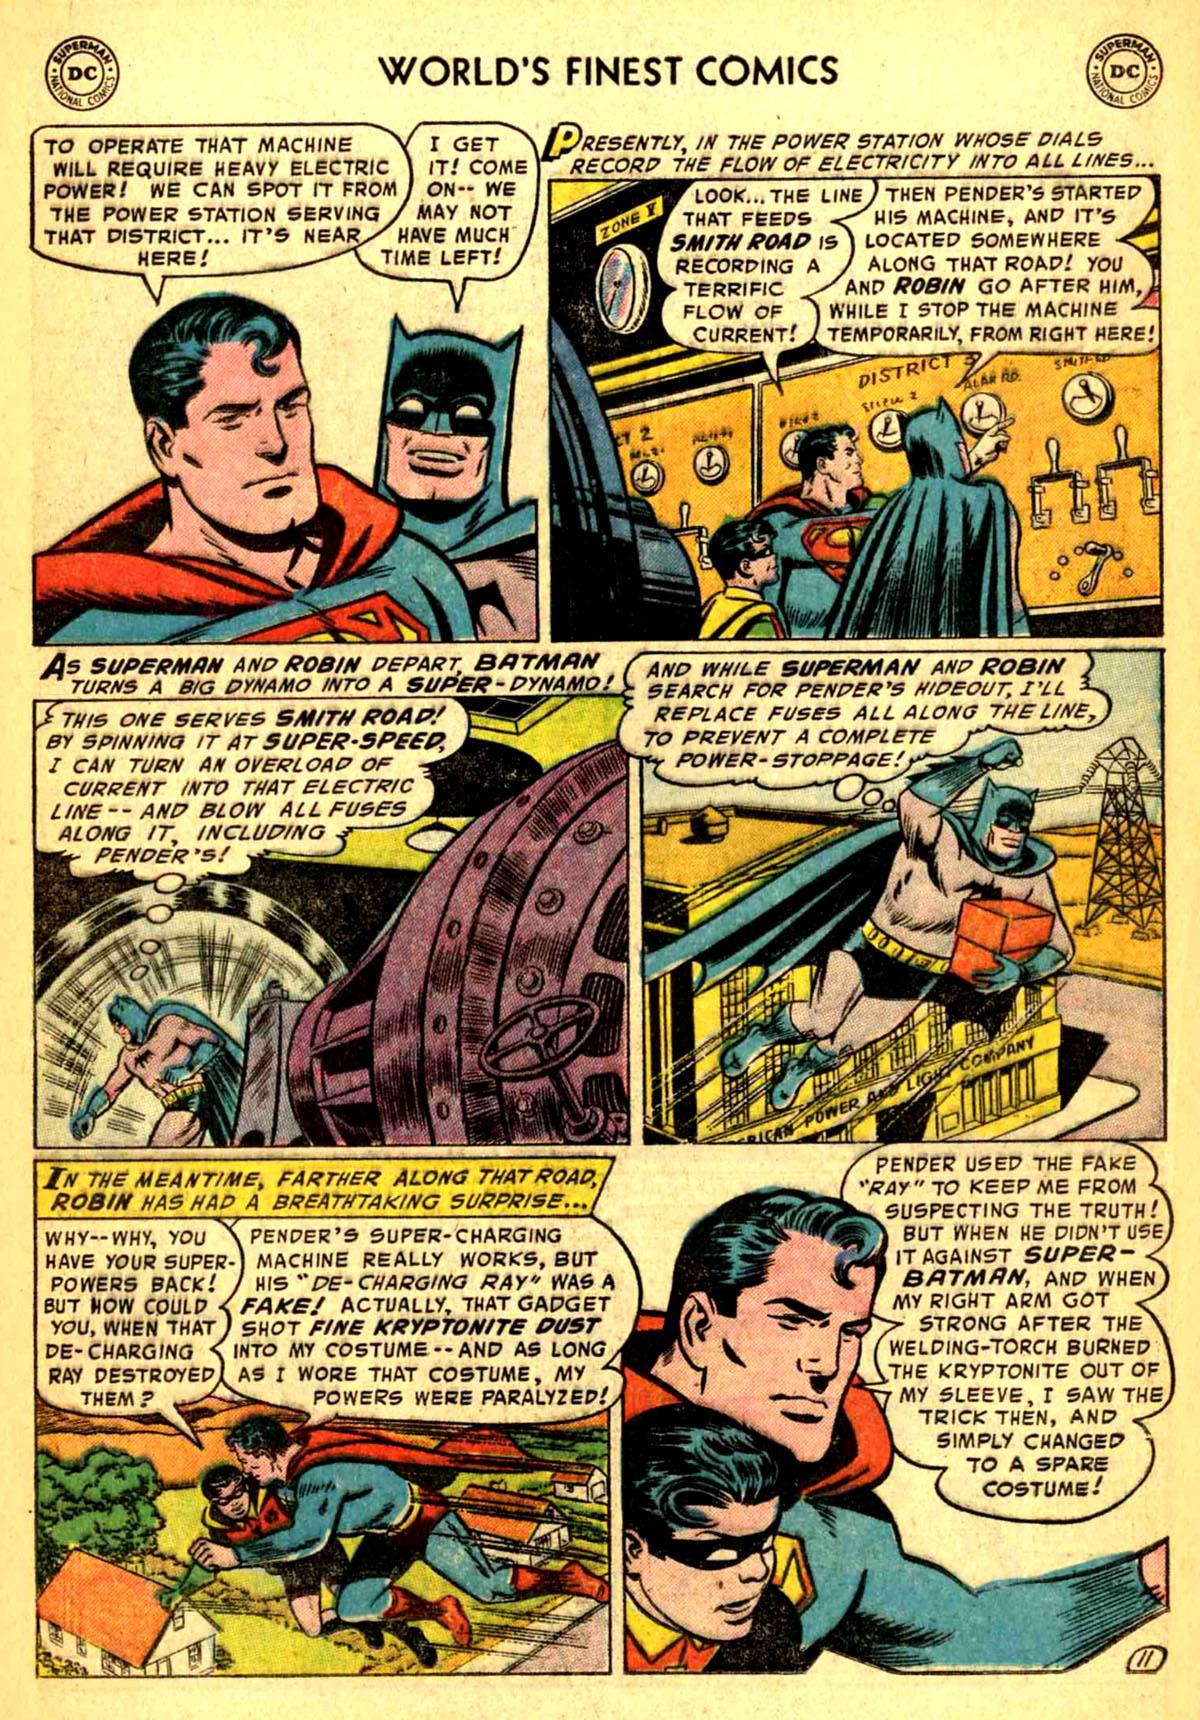 Read online World's Finest Comics comic -  Issue #77 - 13